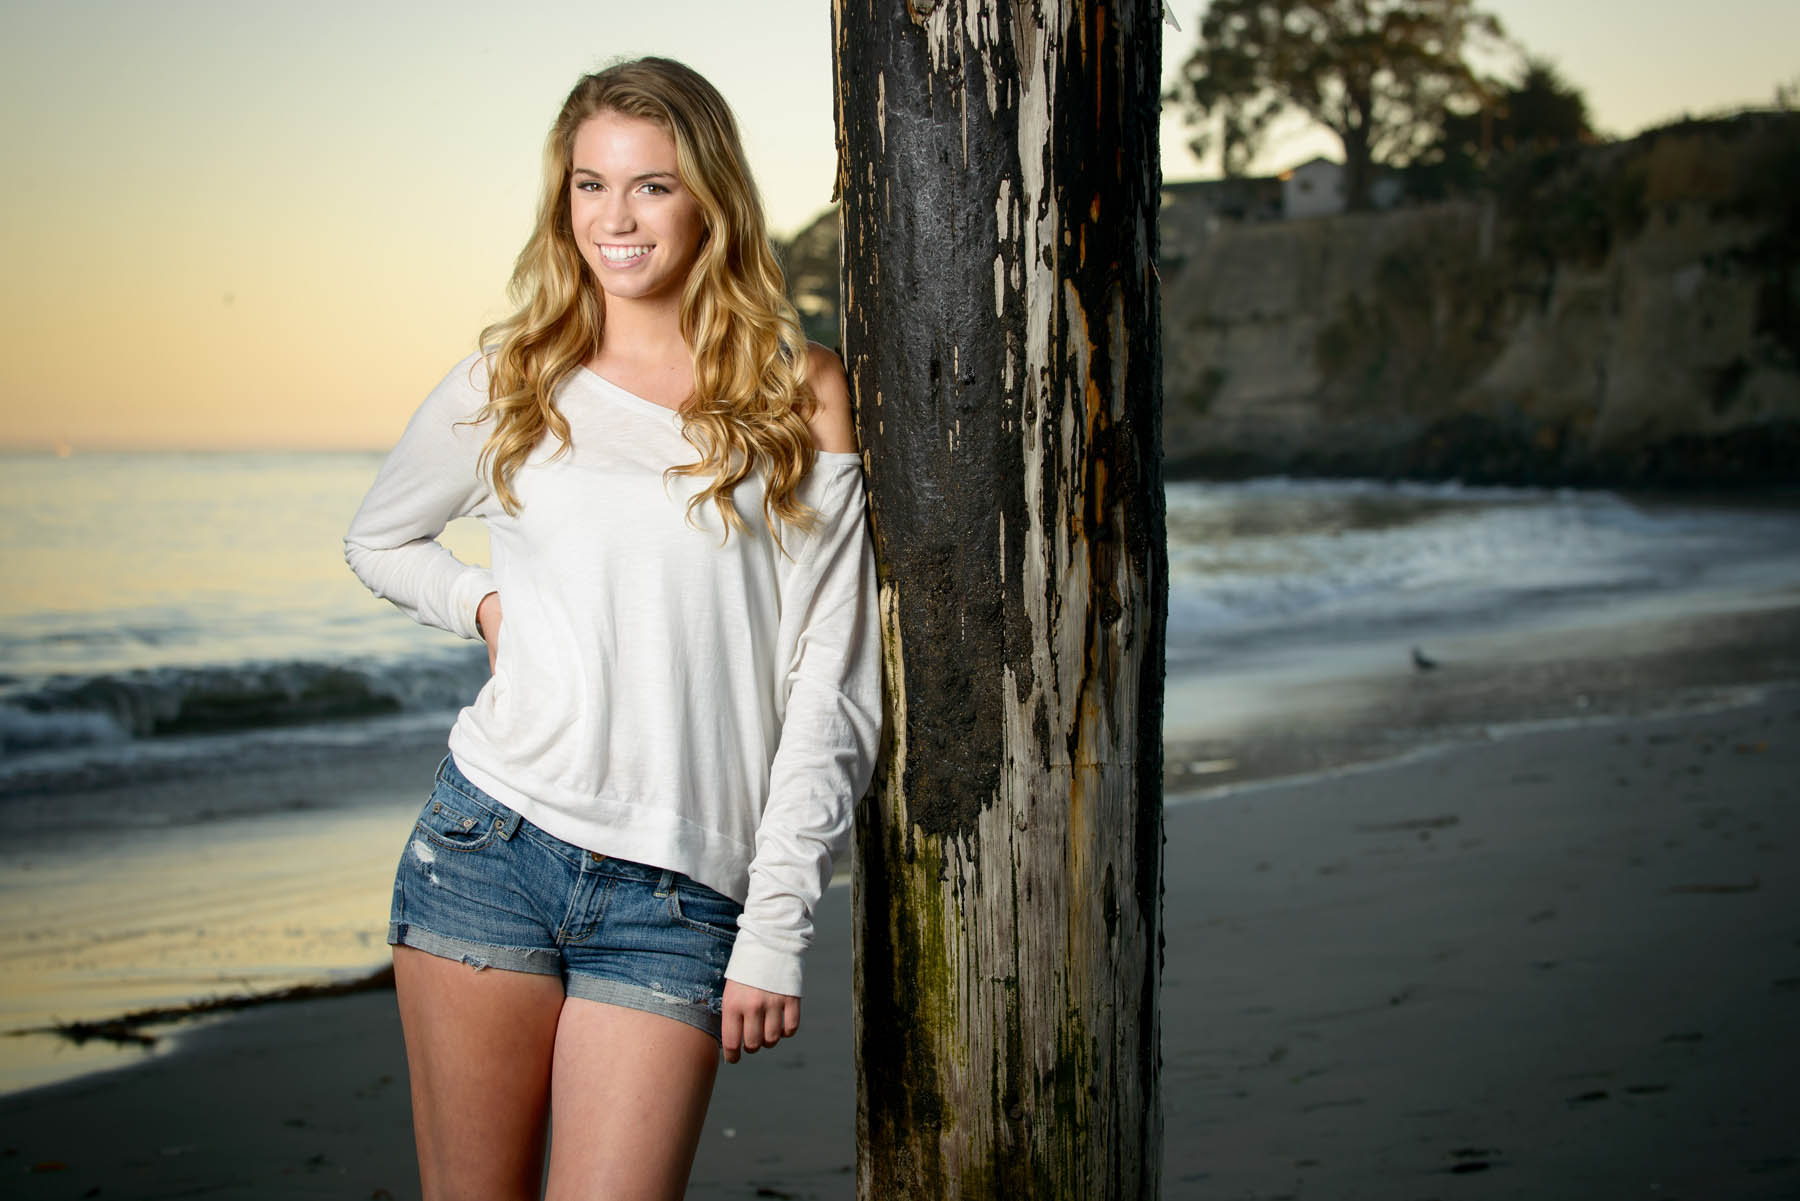 5621_d800b_Jillian_T_Capitola_Beach_Senior_Portrait_Photography.jpg